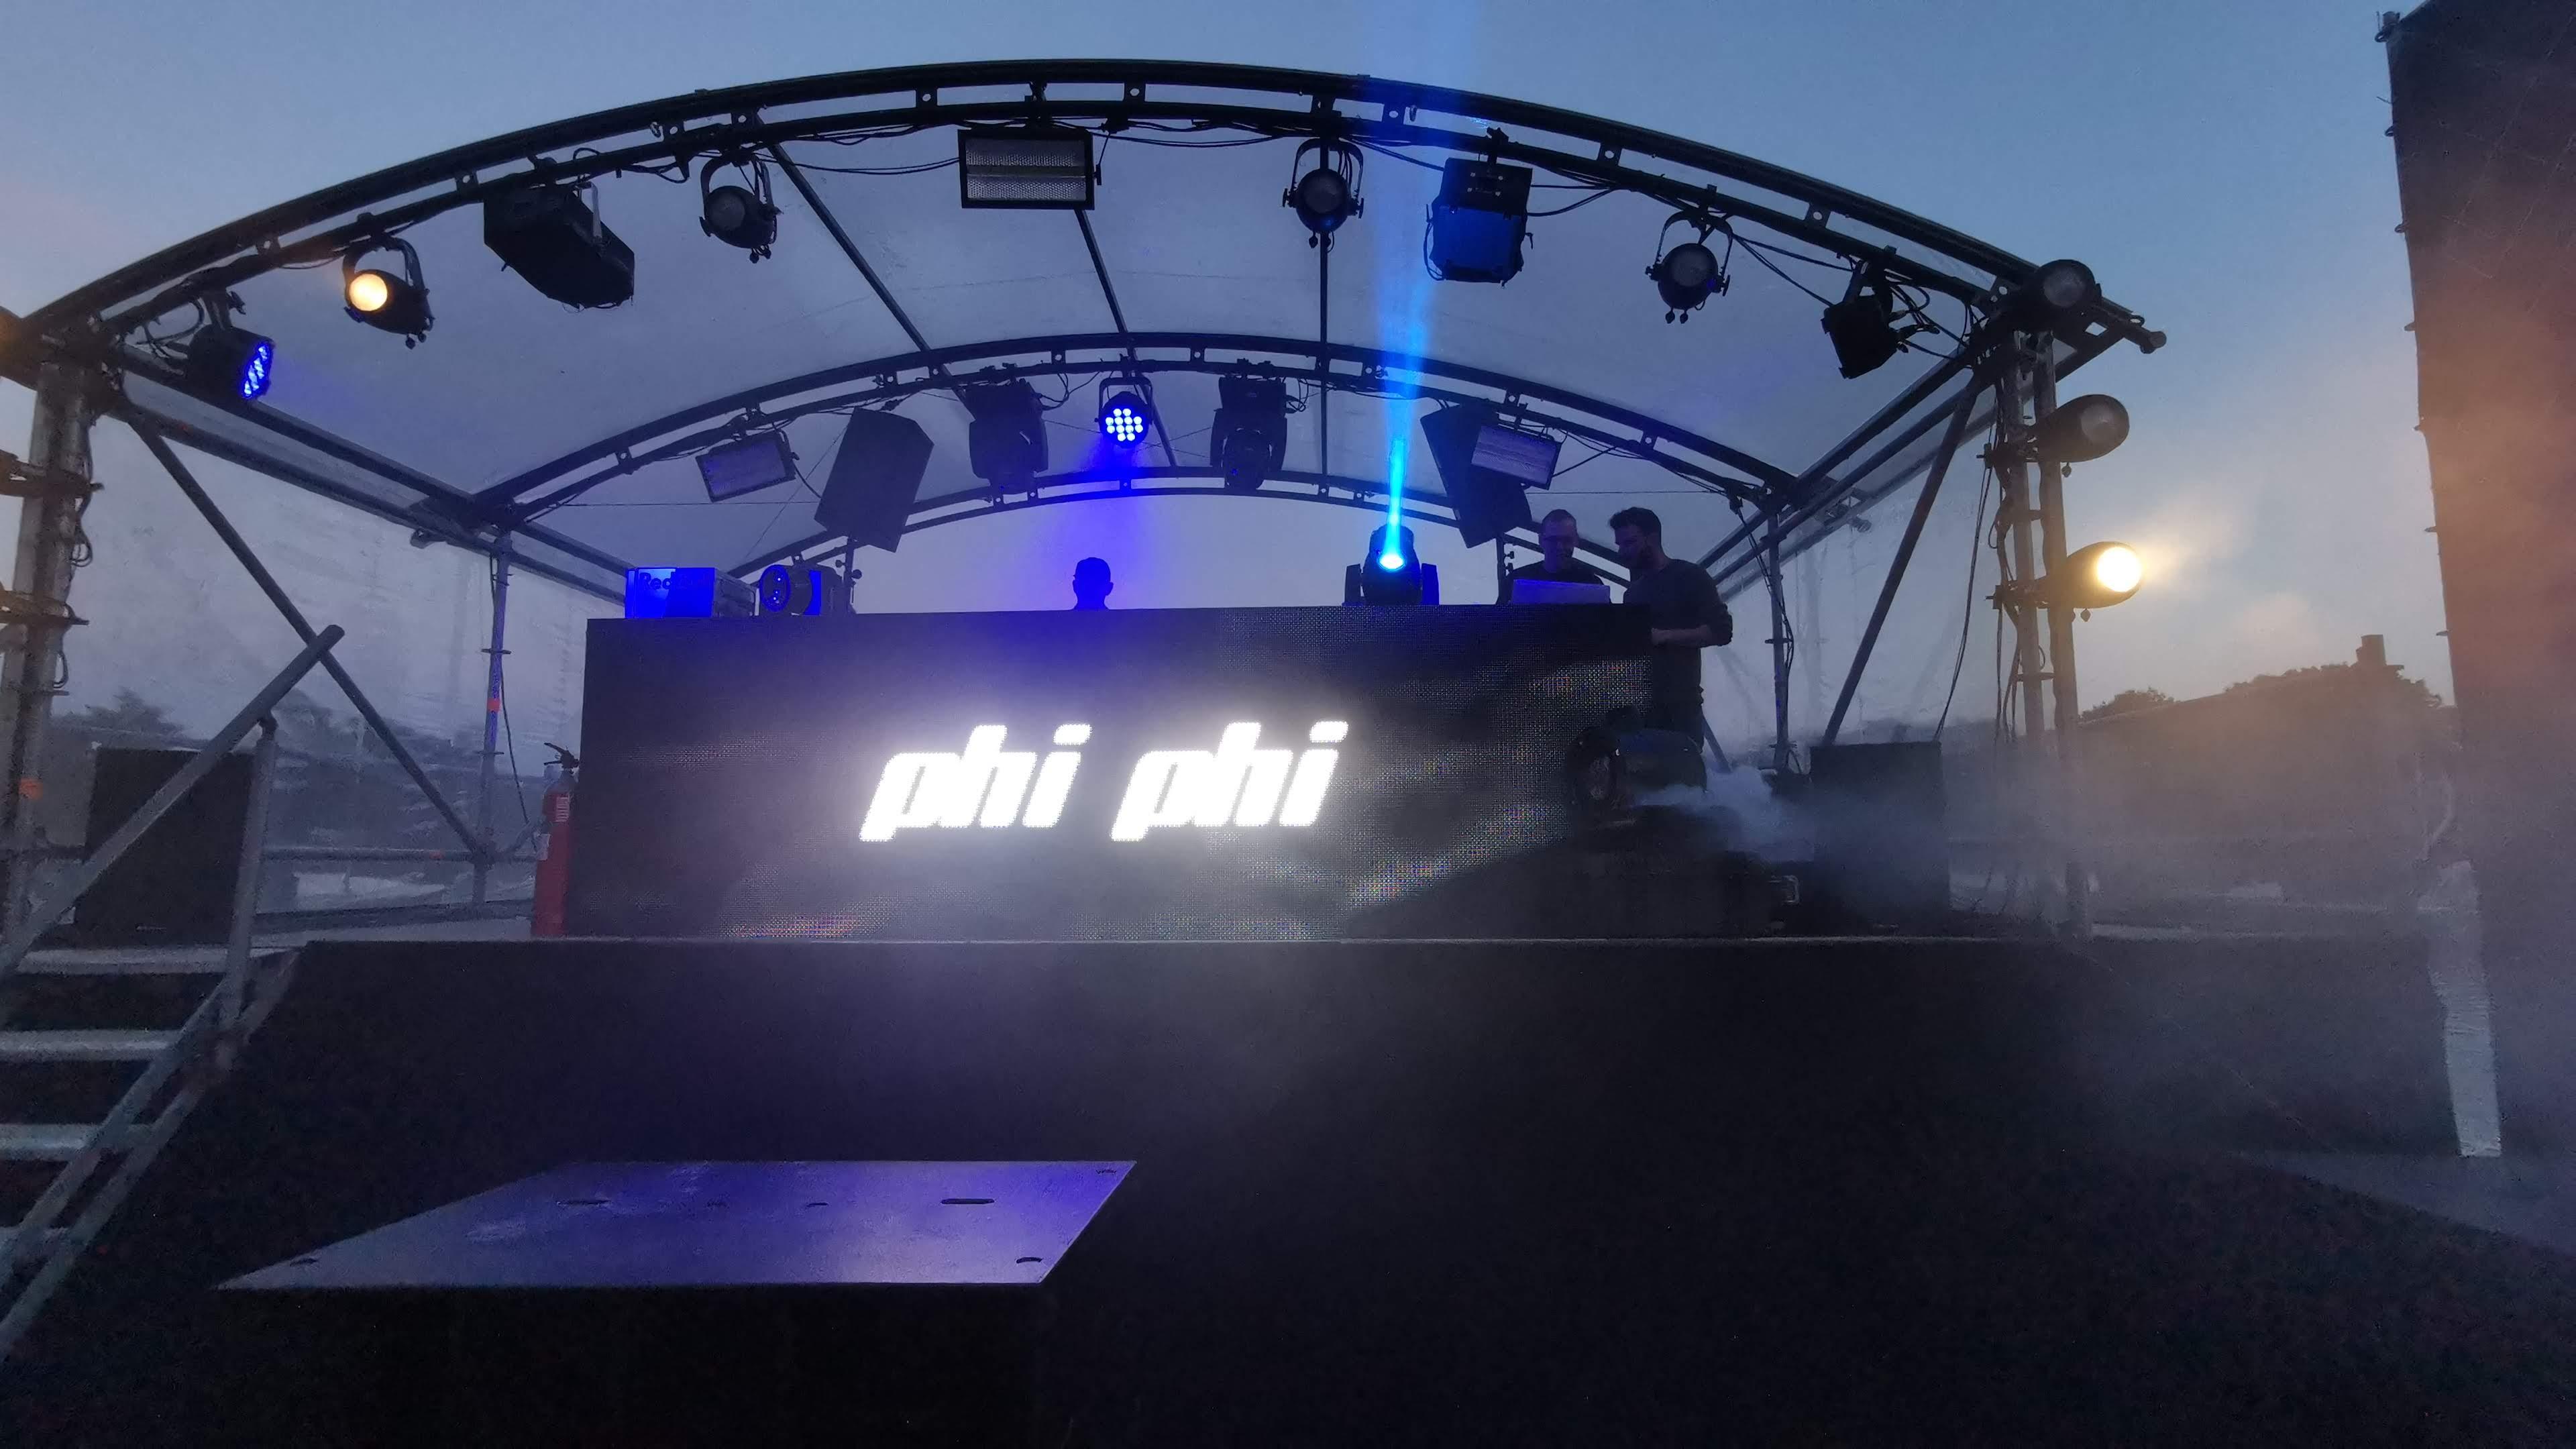 Phi Phi @ Legacy 2019